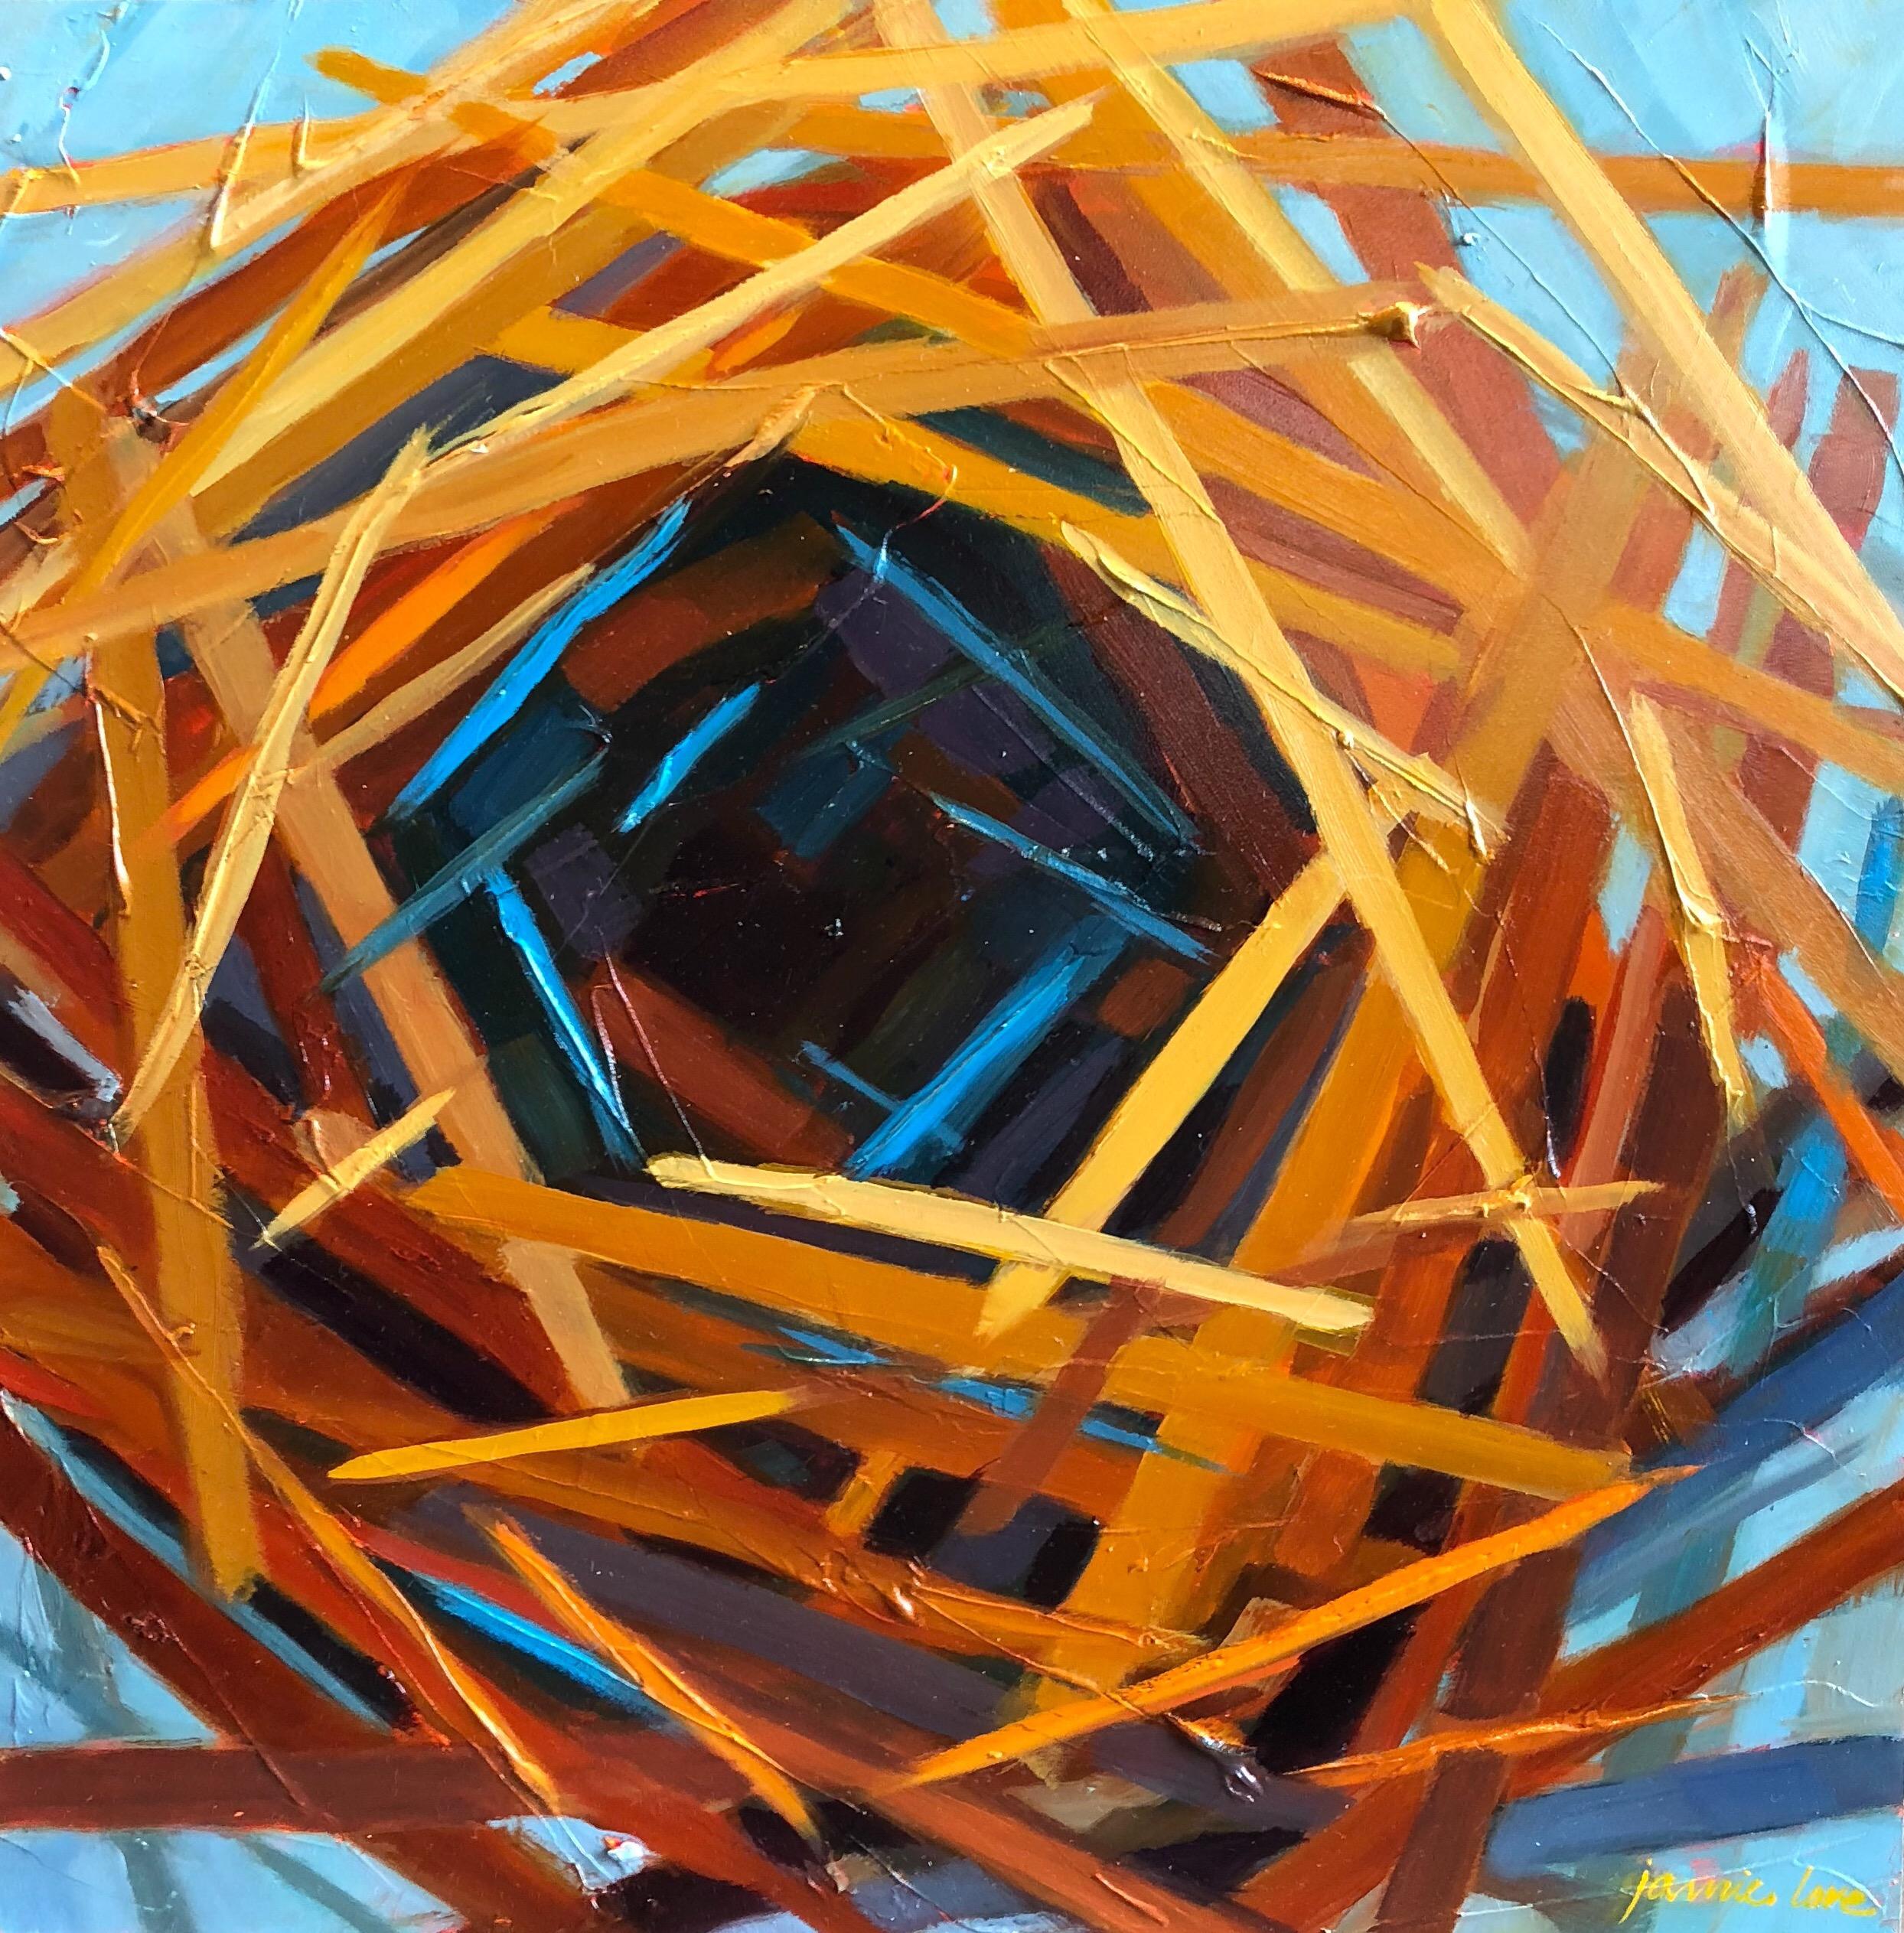 Abstract Empty Nest